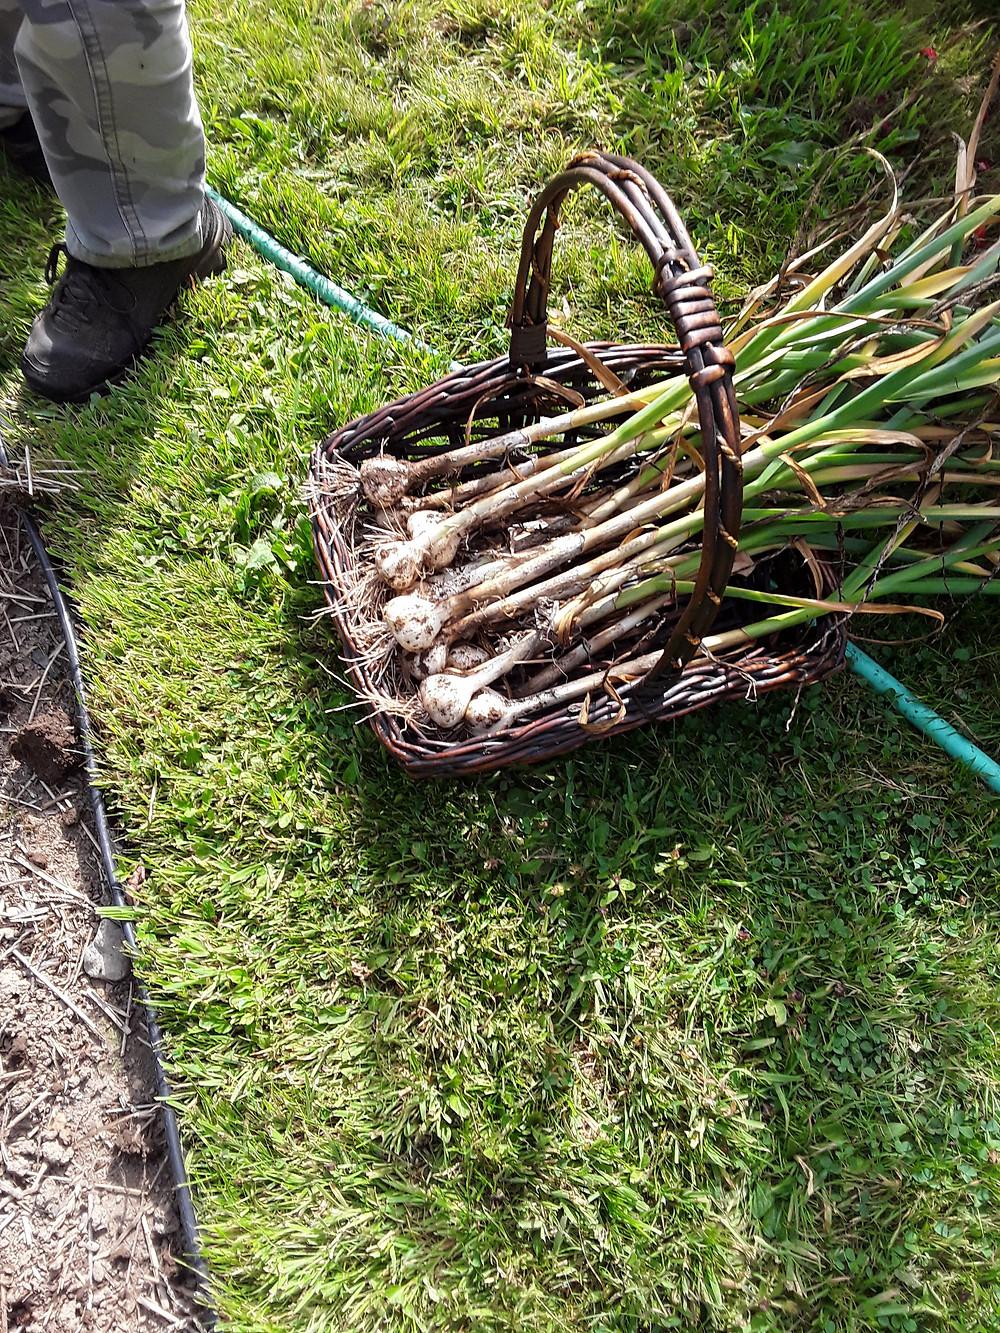 basket of garlic on grass